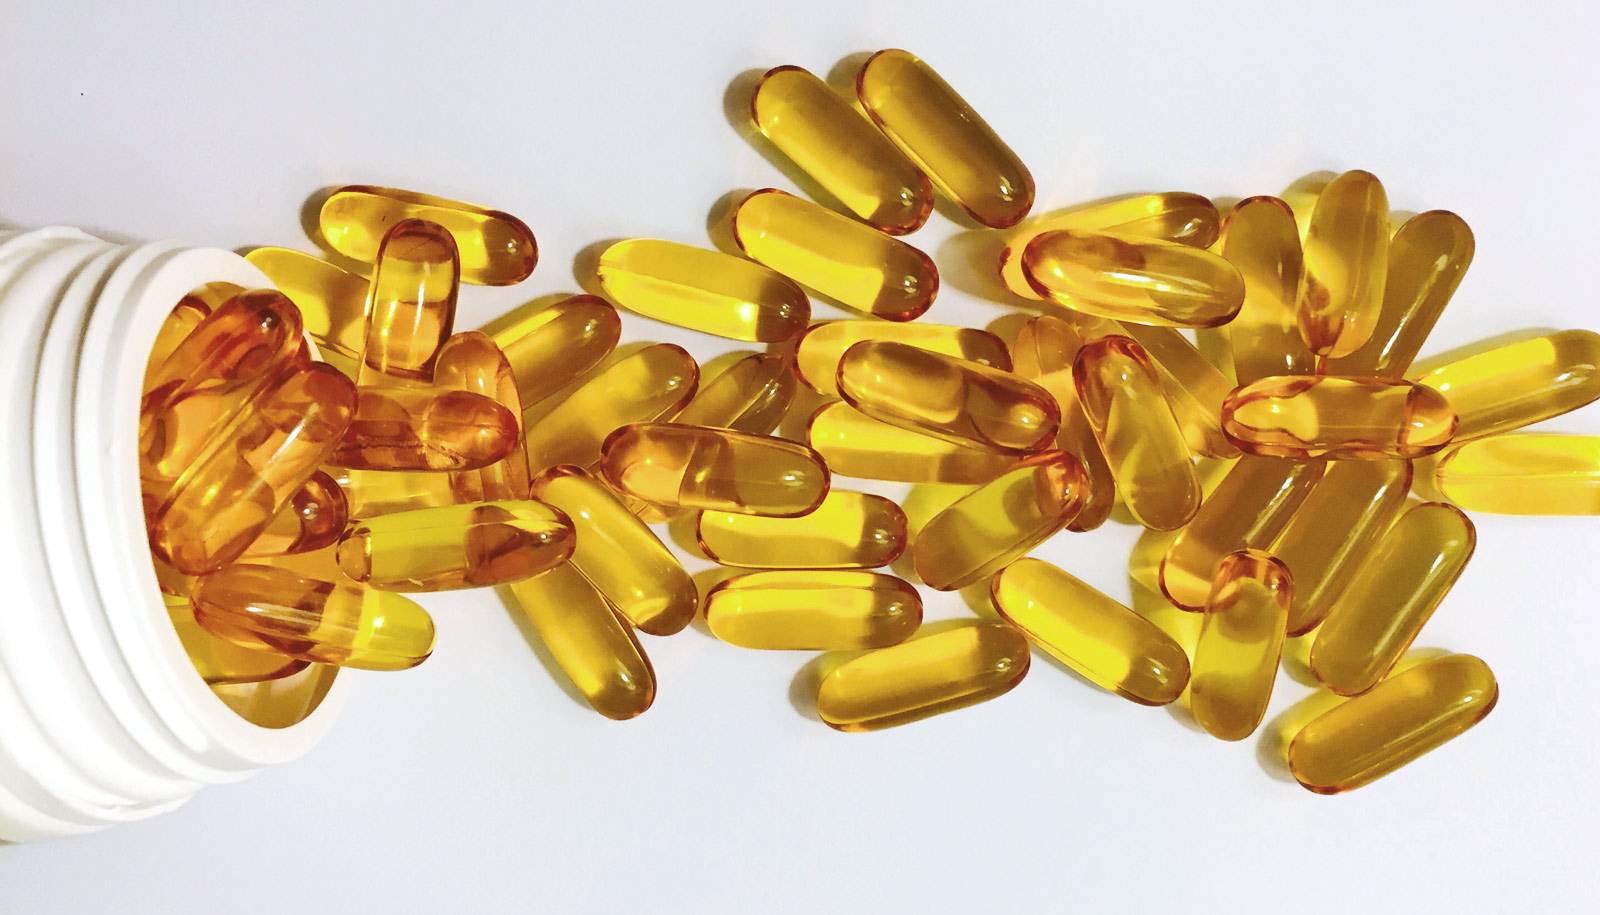 This vitamin may cut asthma airway inflammation - Futurity